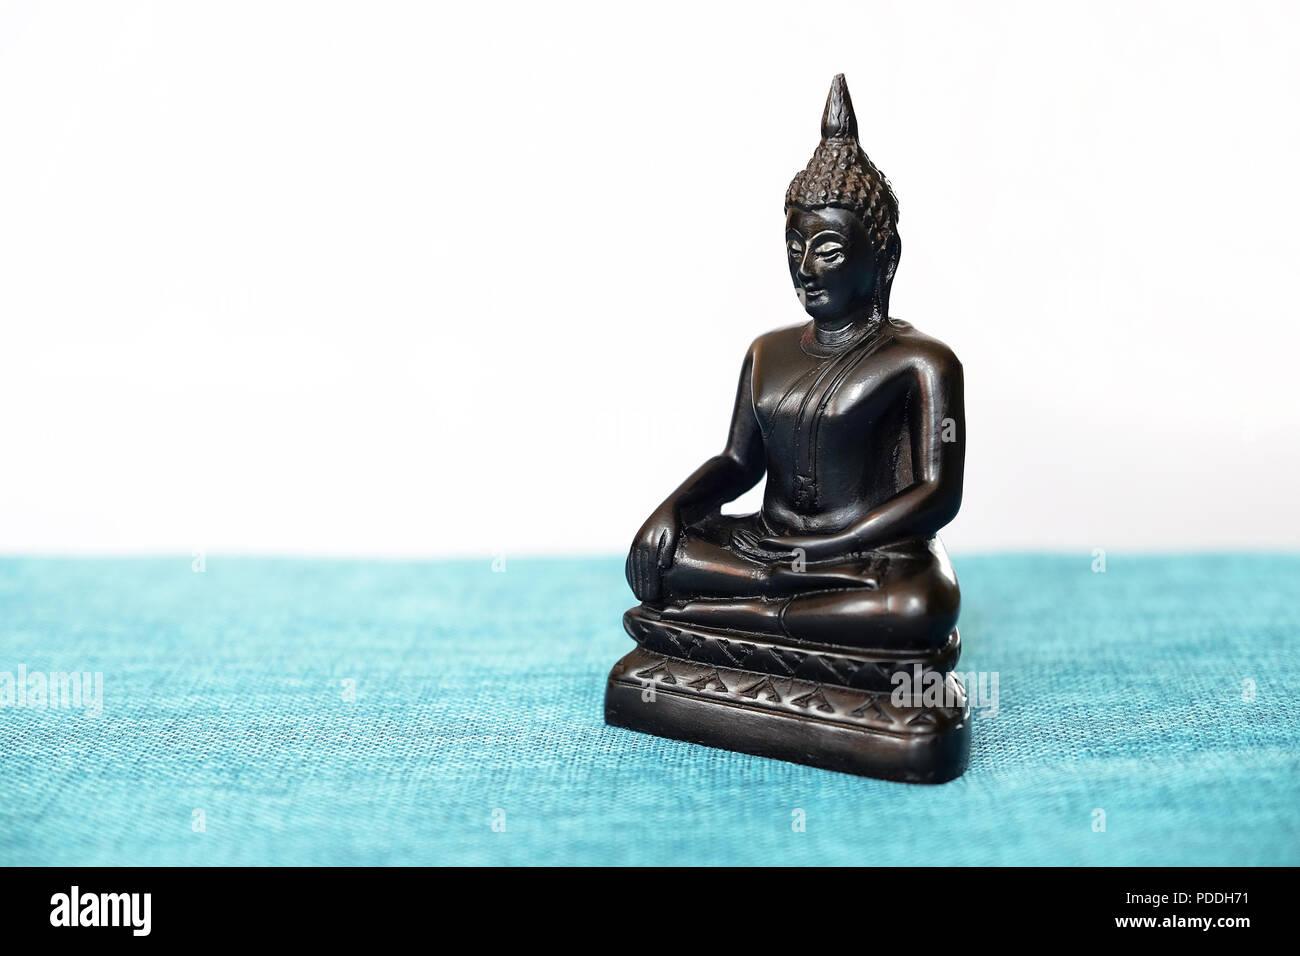 Decorative Buddha Statue Buddha On The Background Of